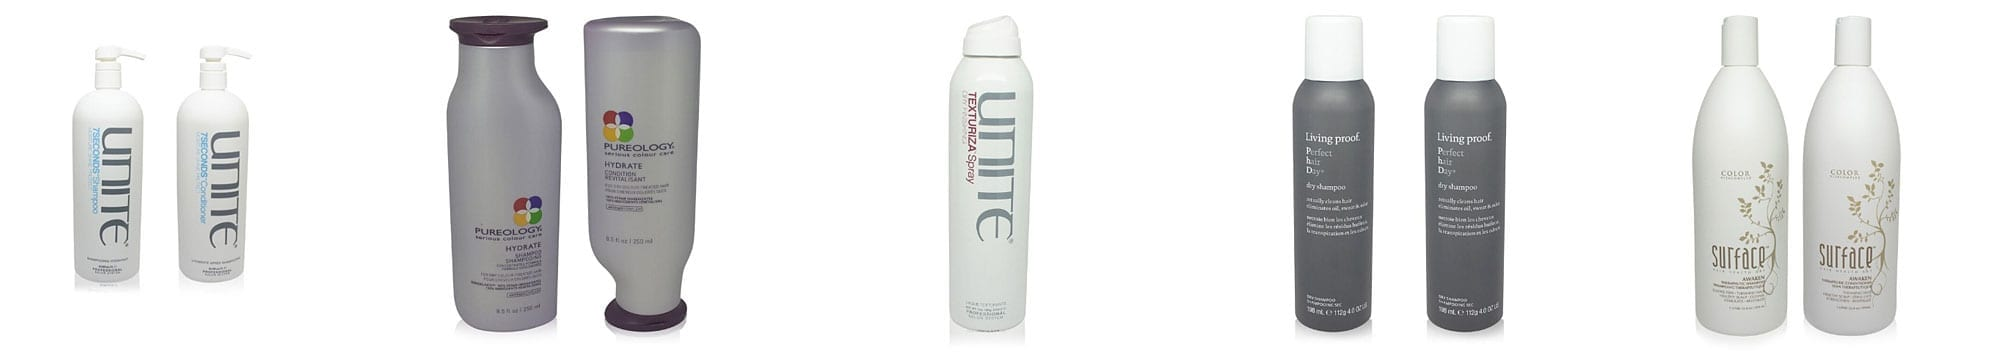 Best Sellers Hair Care